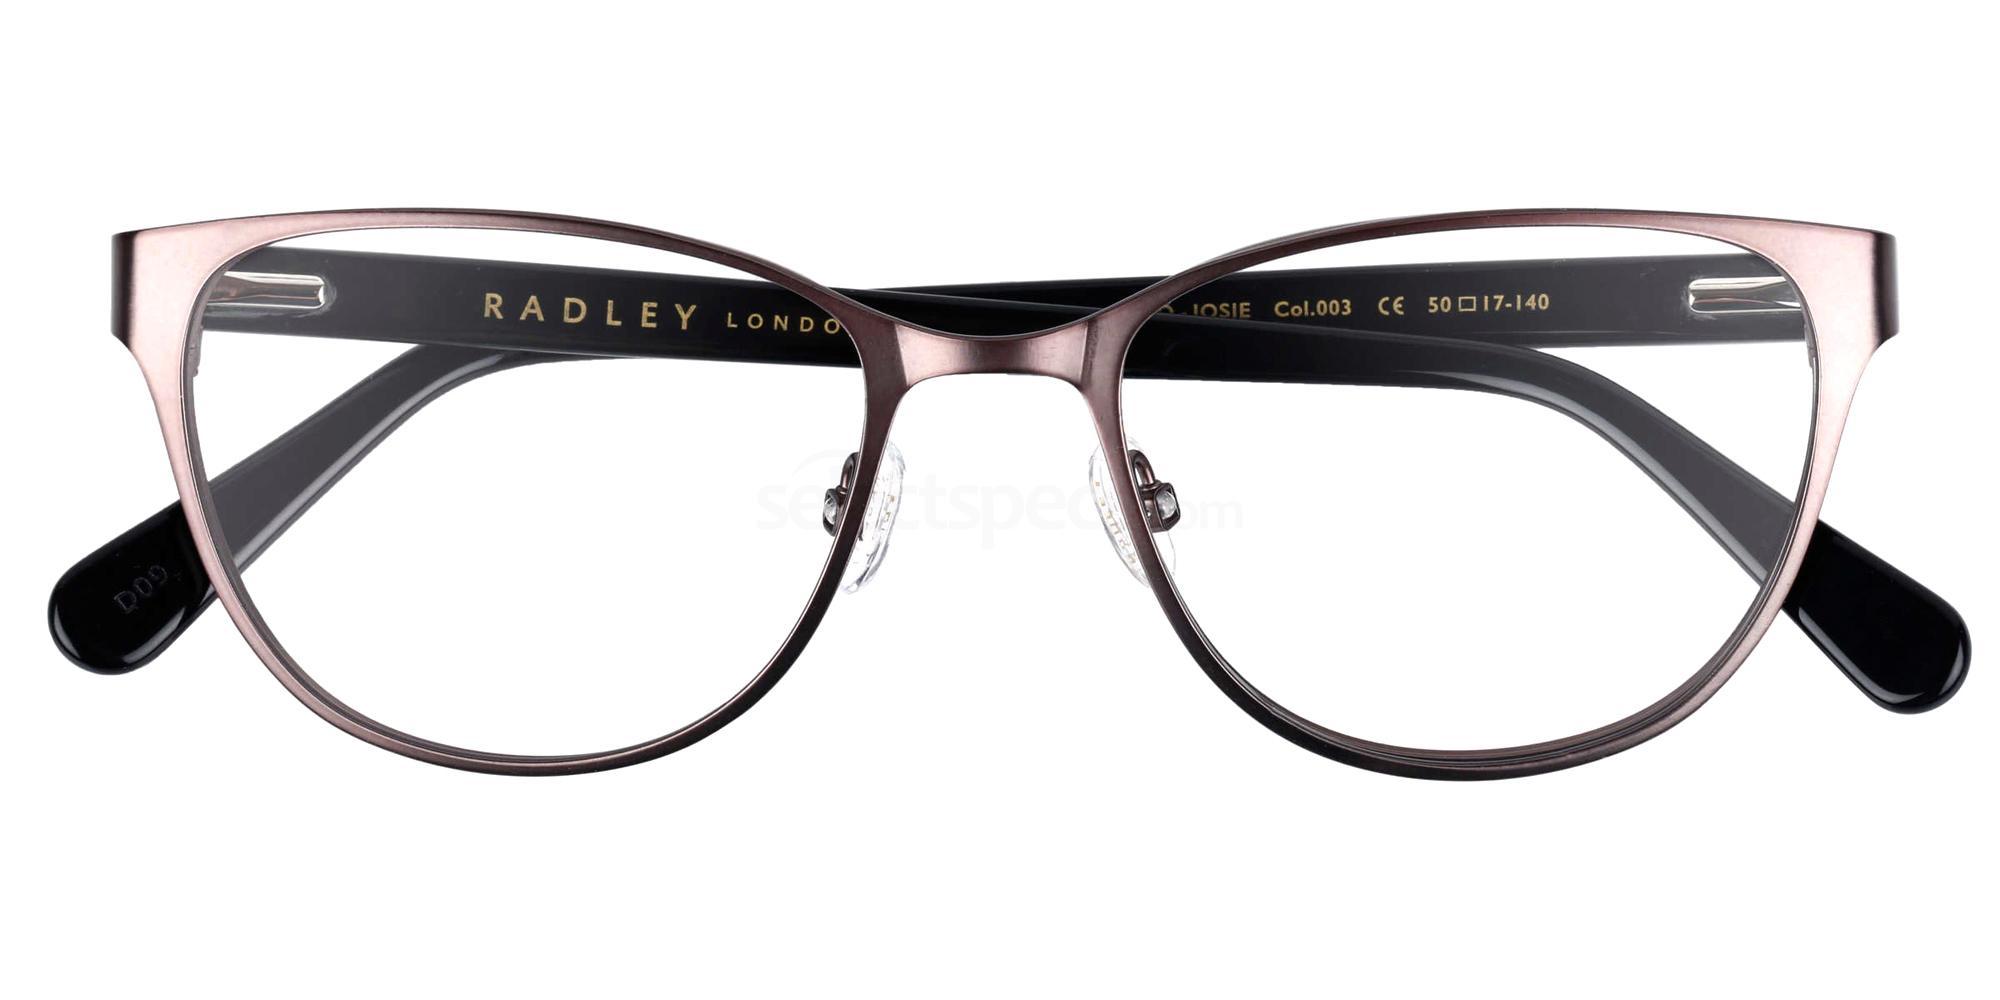 003 RDO-JOSIE Glasses, Radley London